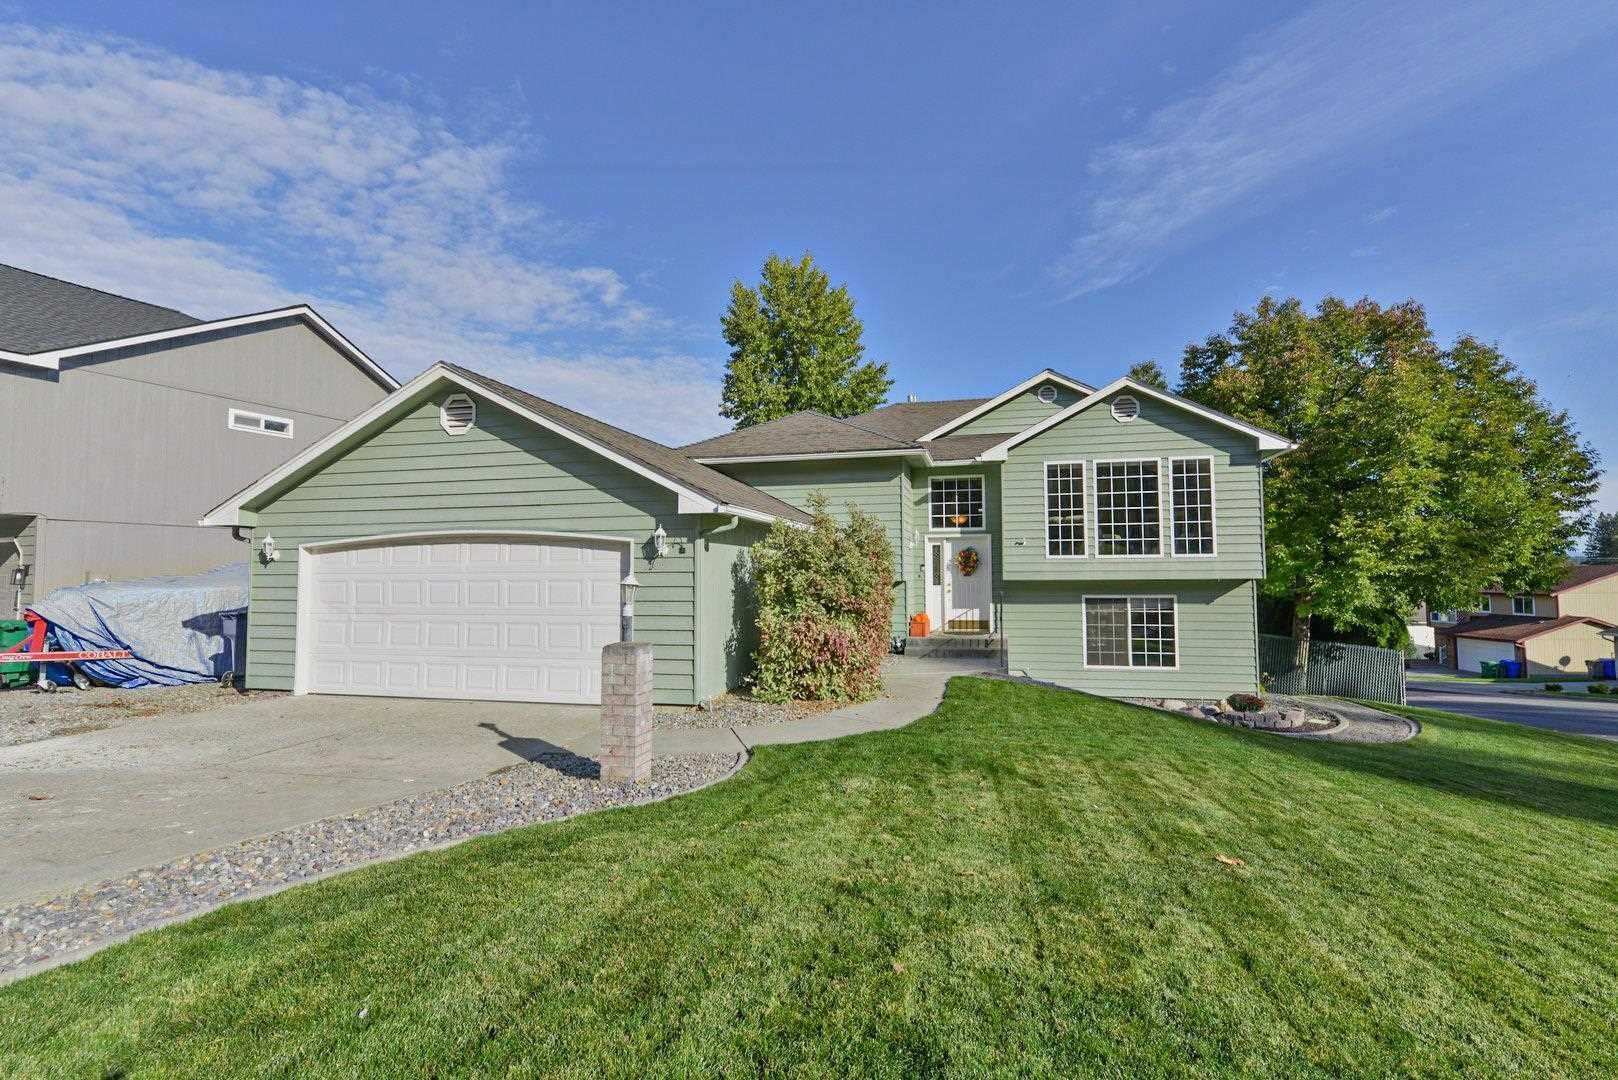 11405 E 42nd Ct, Spokane Valley, WA 99206 - #: 202123640